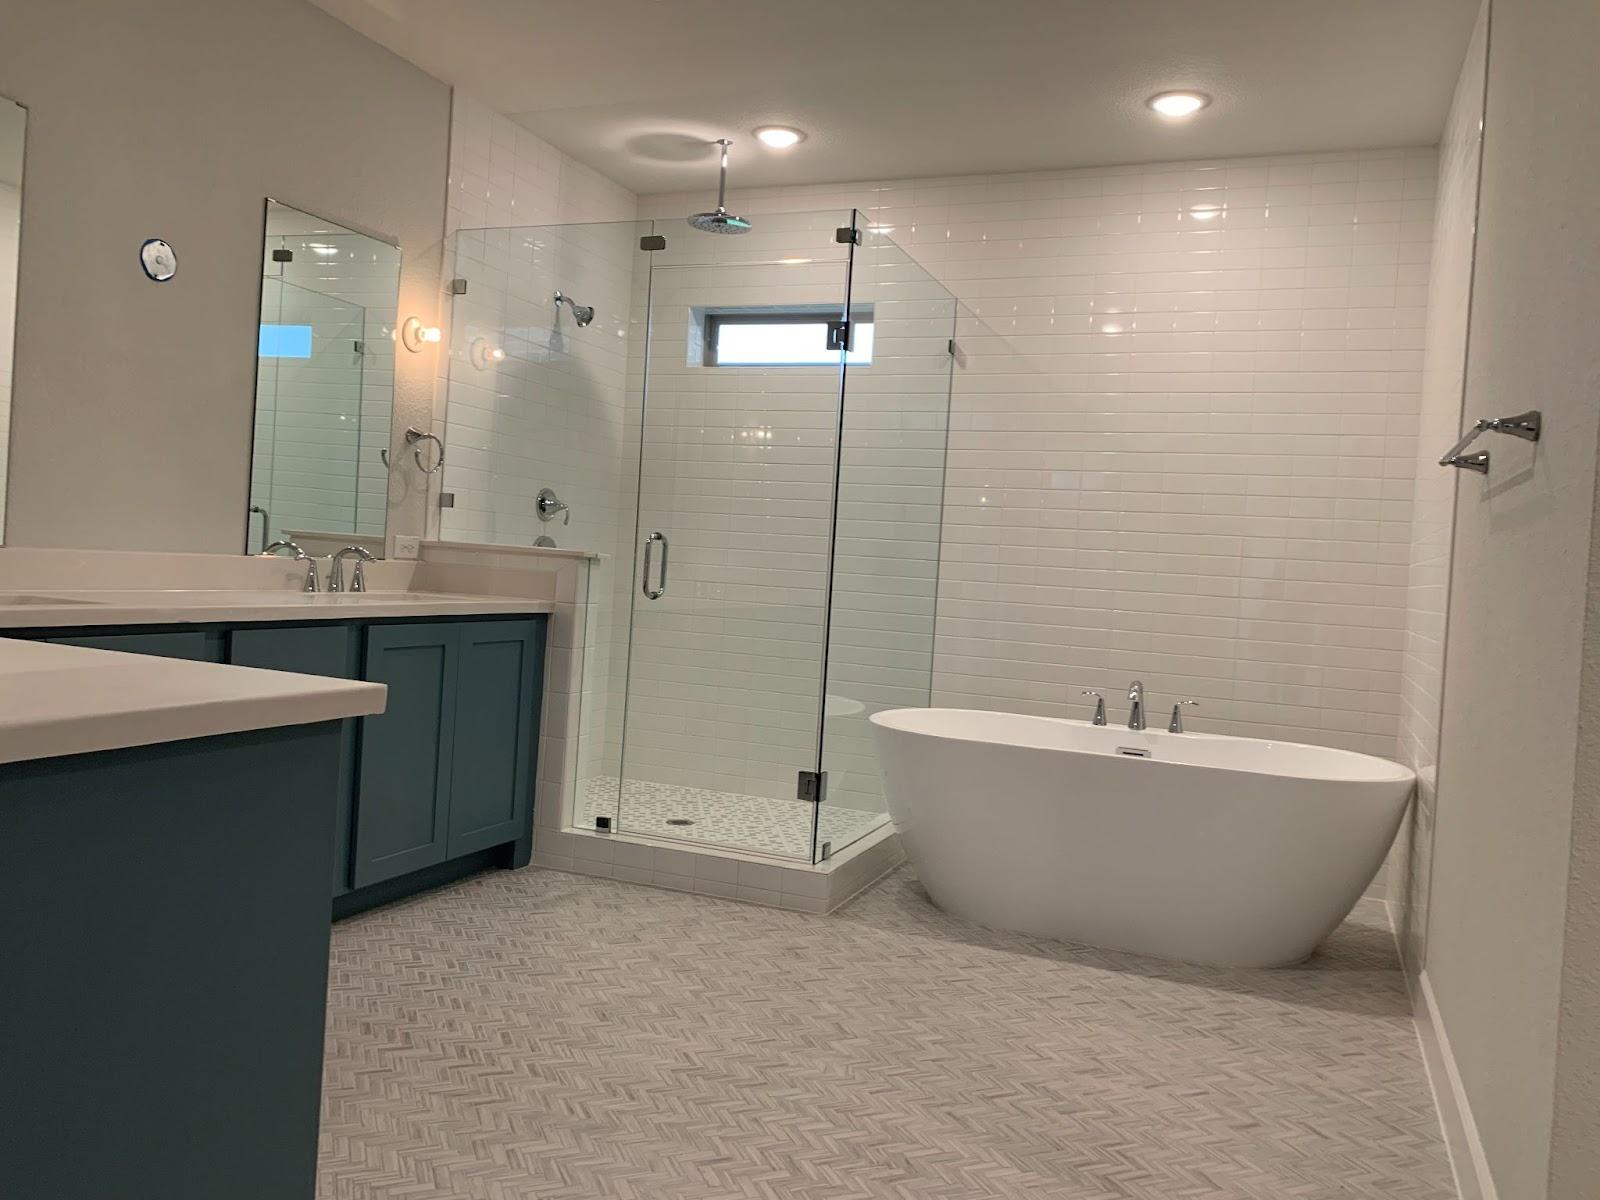 builder-grade home subway tile free standing tub vanity